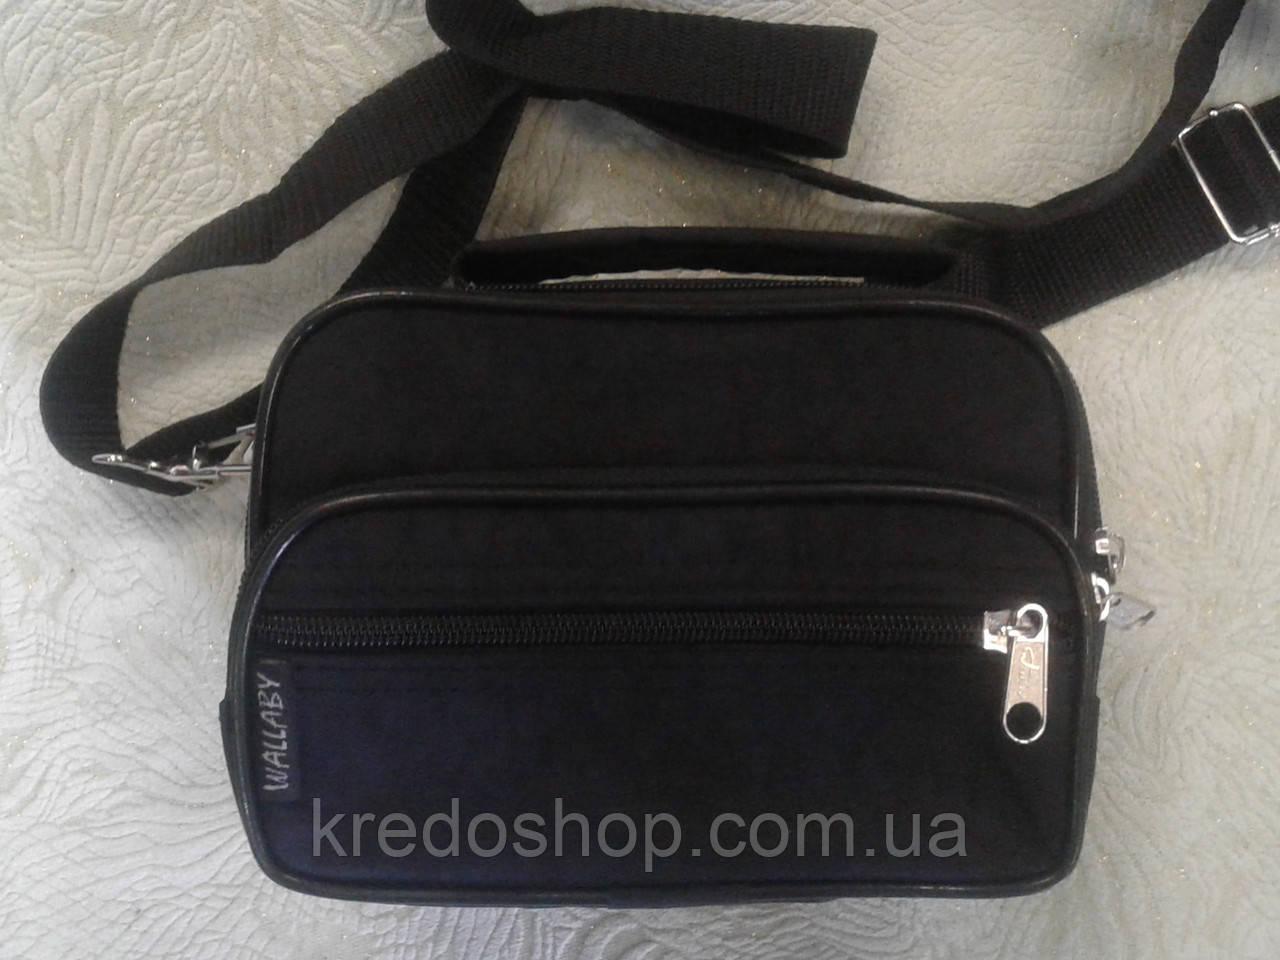 aa1b8dd5ab1f Сумка мужская черная прочная,компактная на плечо(Украина) -  Интернет-магазин сумок